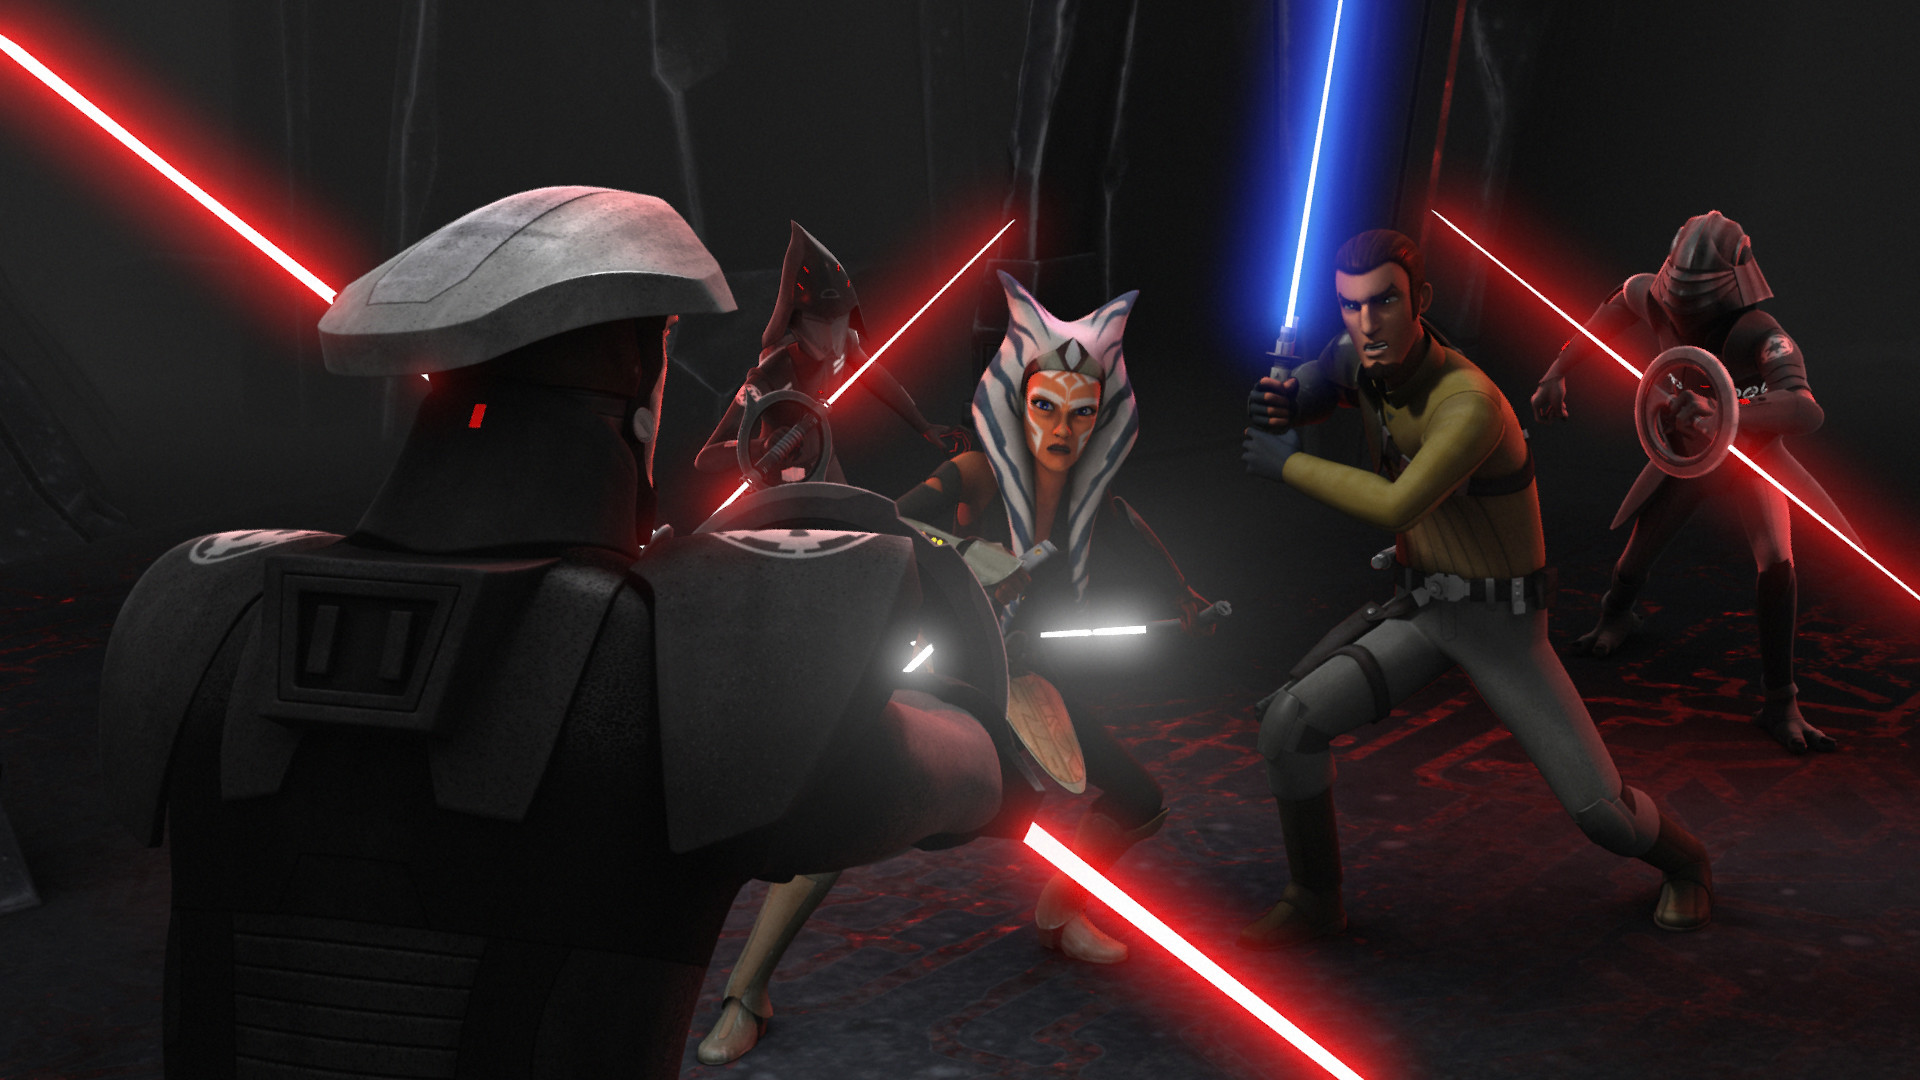 Star Wars Rebels Wallpaper 80 Images